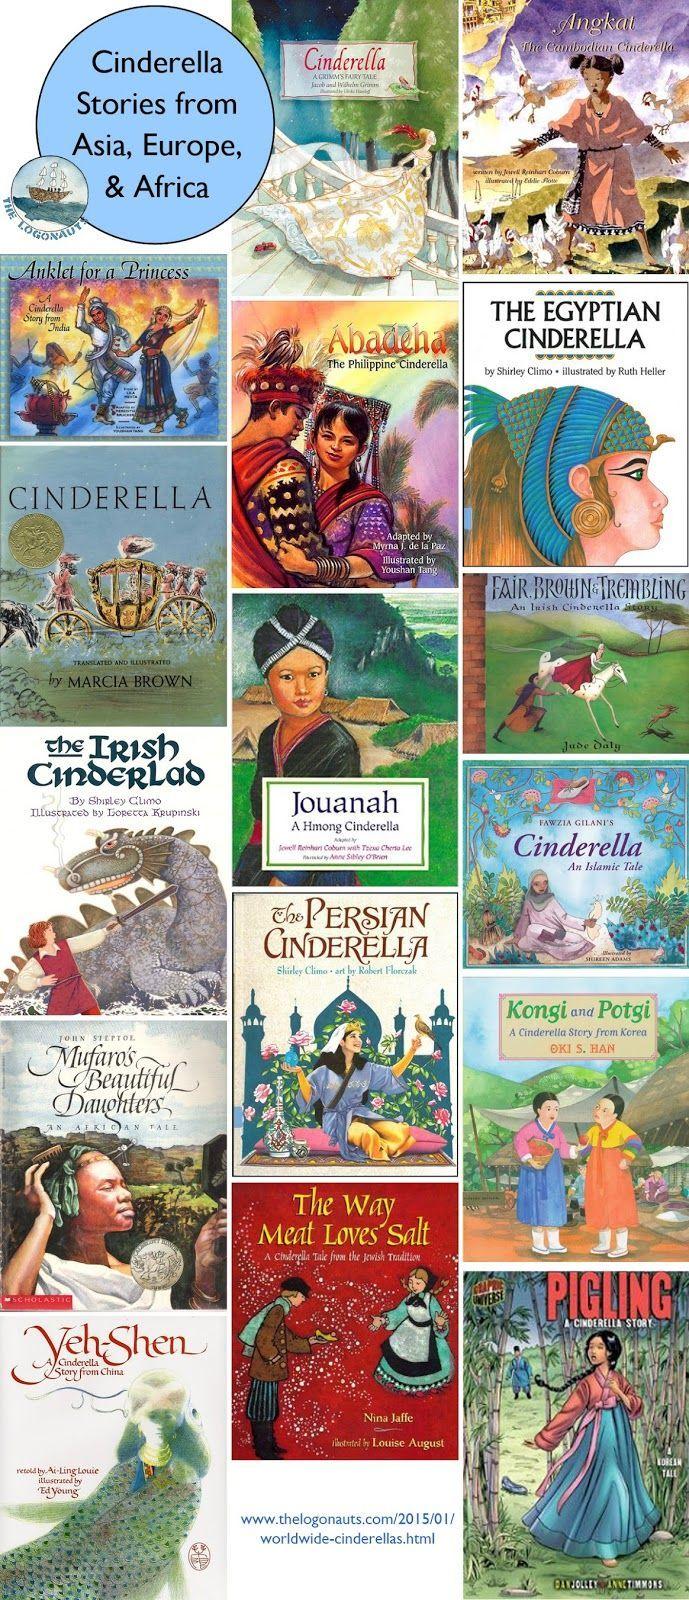 Worldwide Cinderellas, Part 1: Asia, Europe, & Africa | The Logonauts